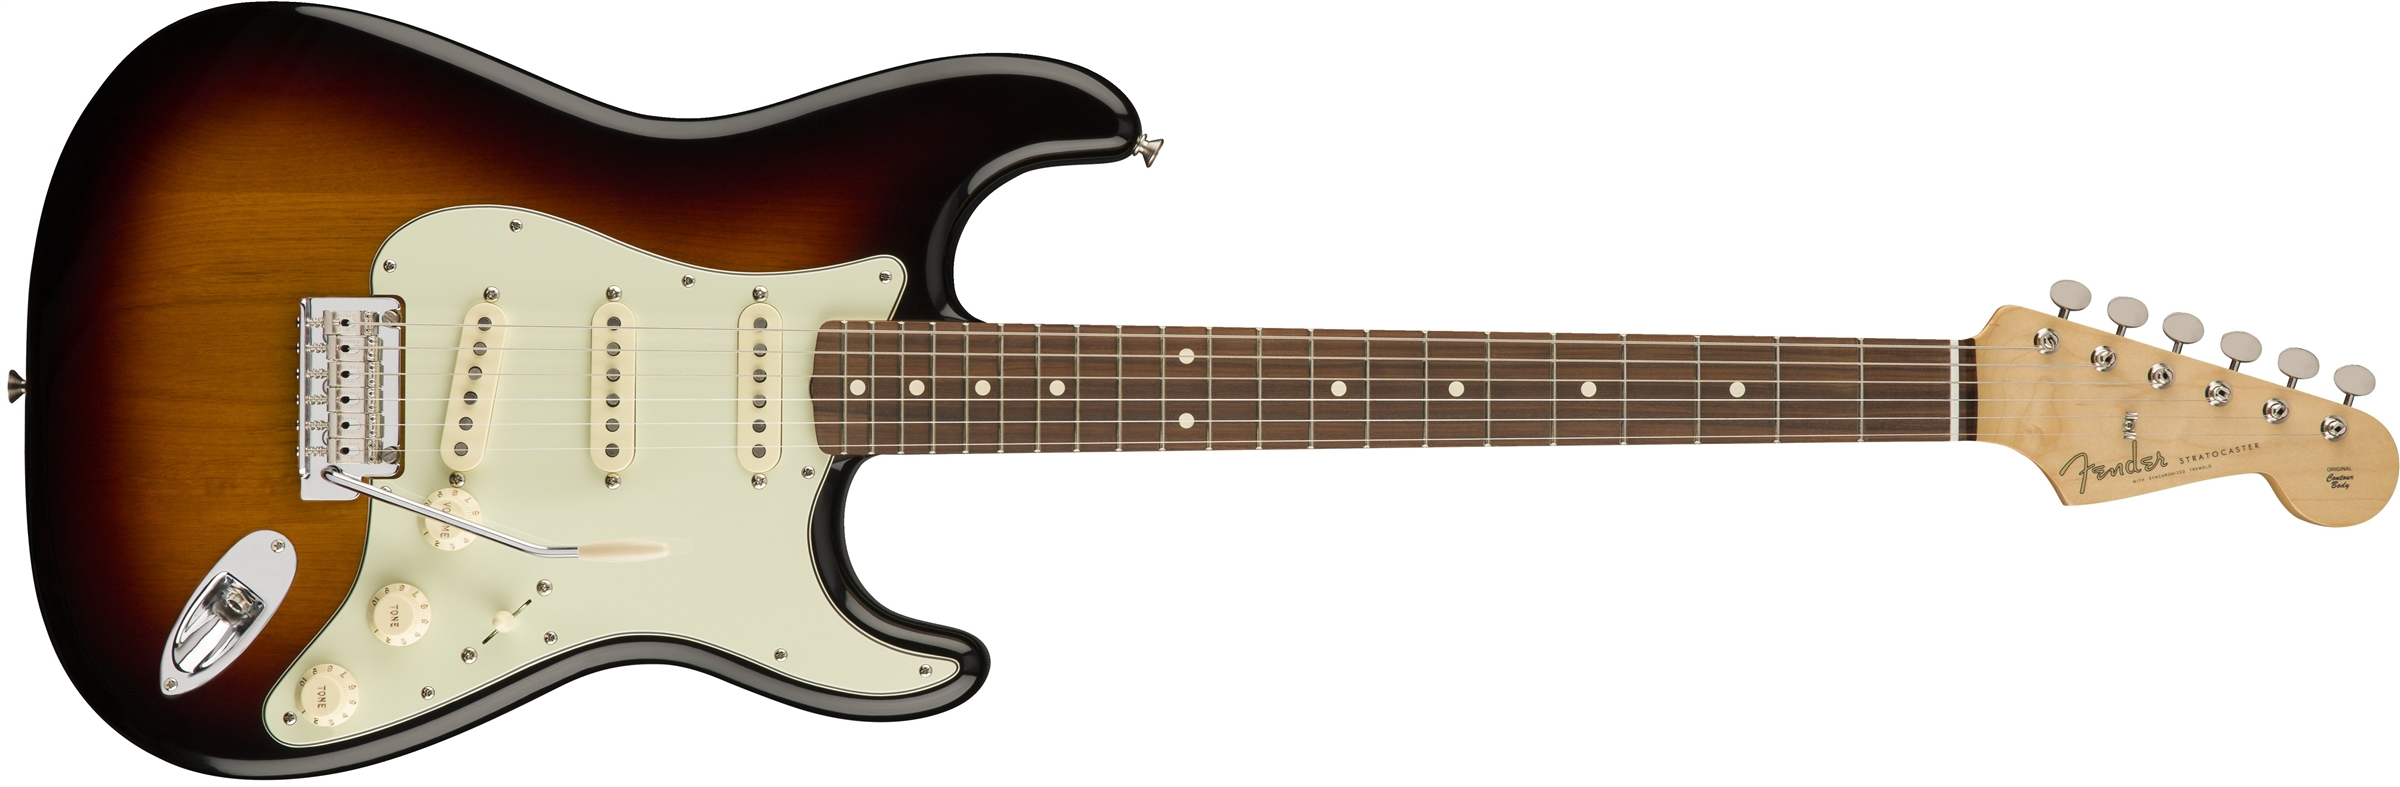 fender classic player 39 60s stratocaster pau ferro fingerboard 3 color sunburst. Black Bedroom Furniture Sets. Home Design Ideas